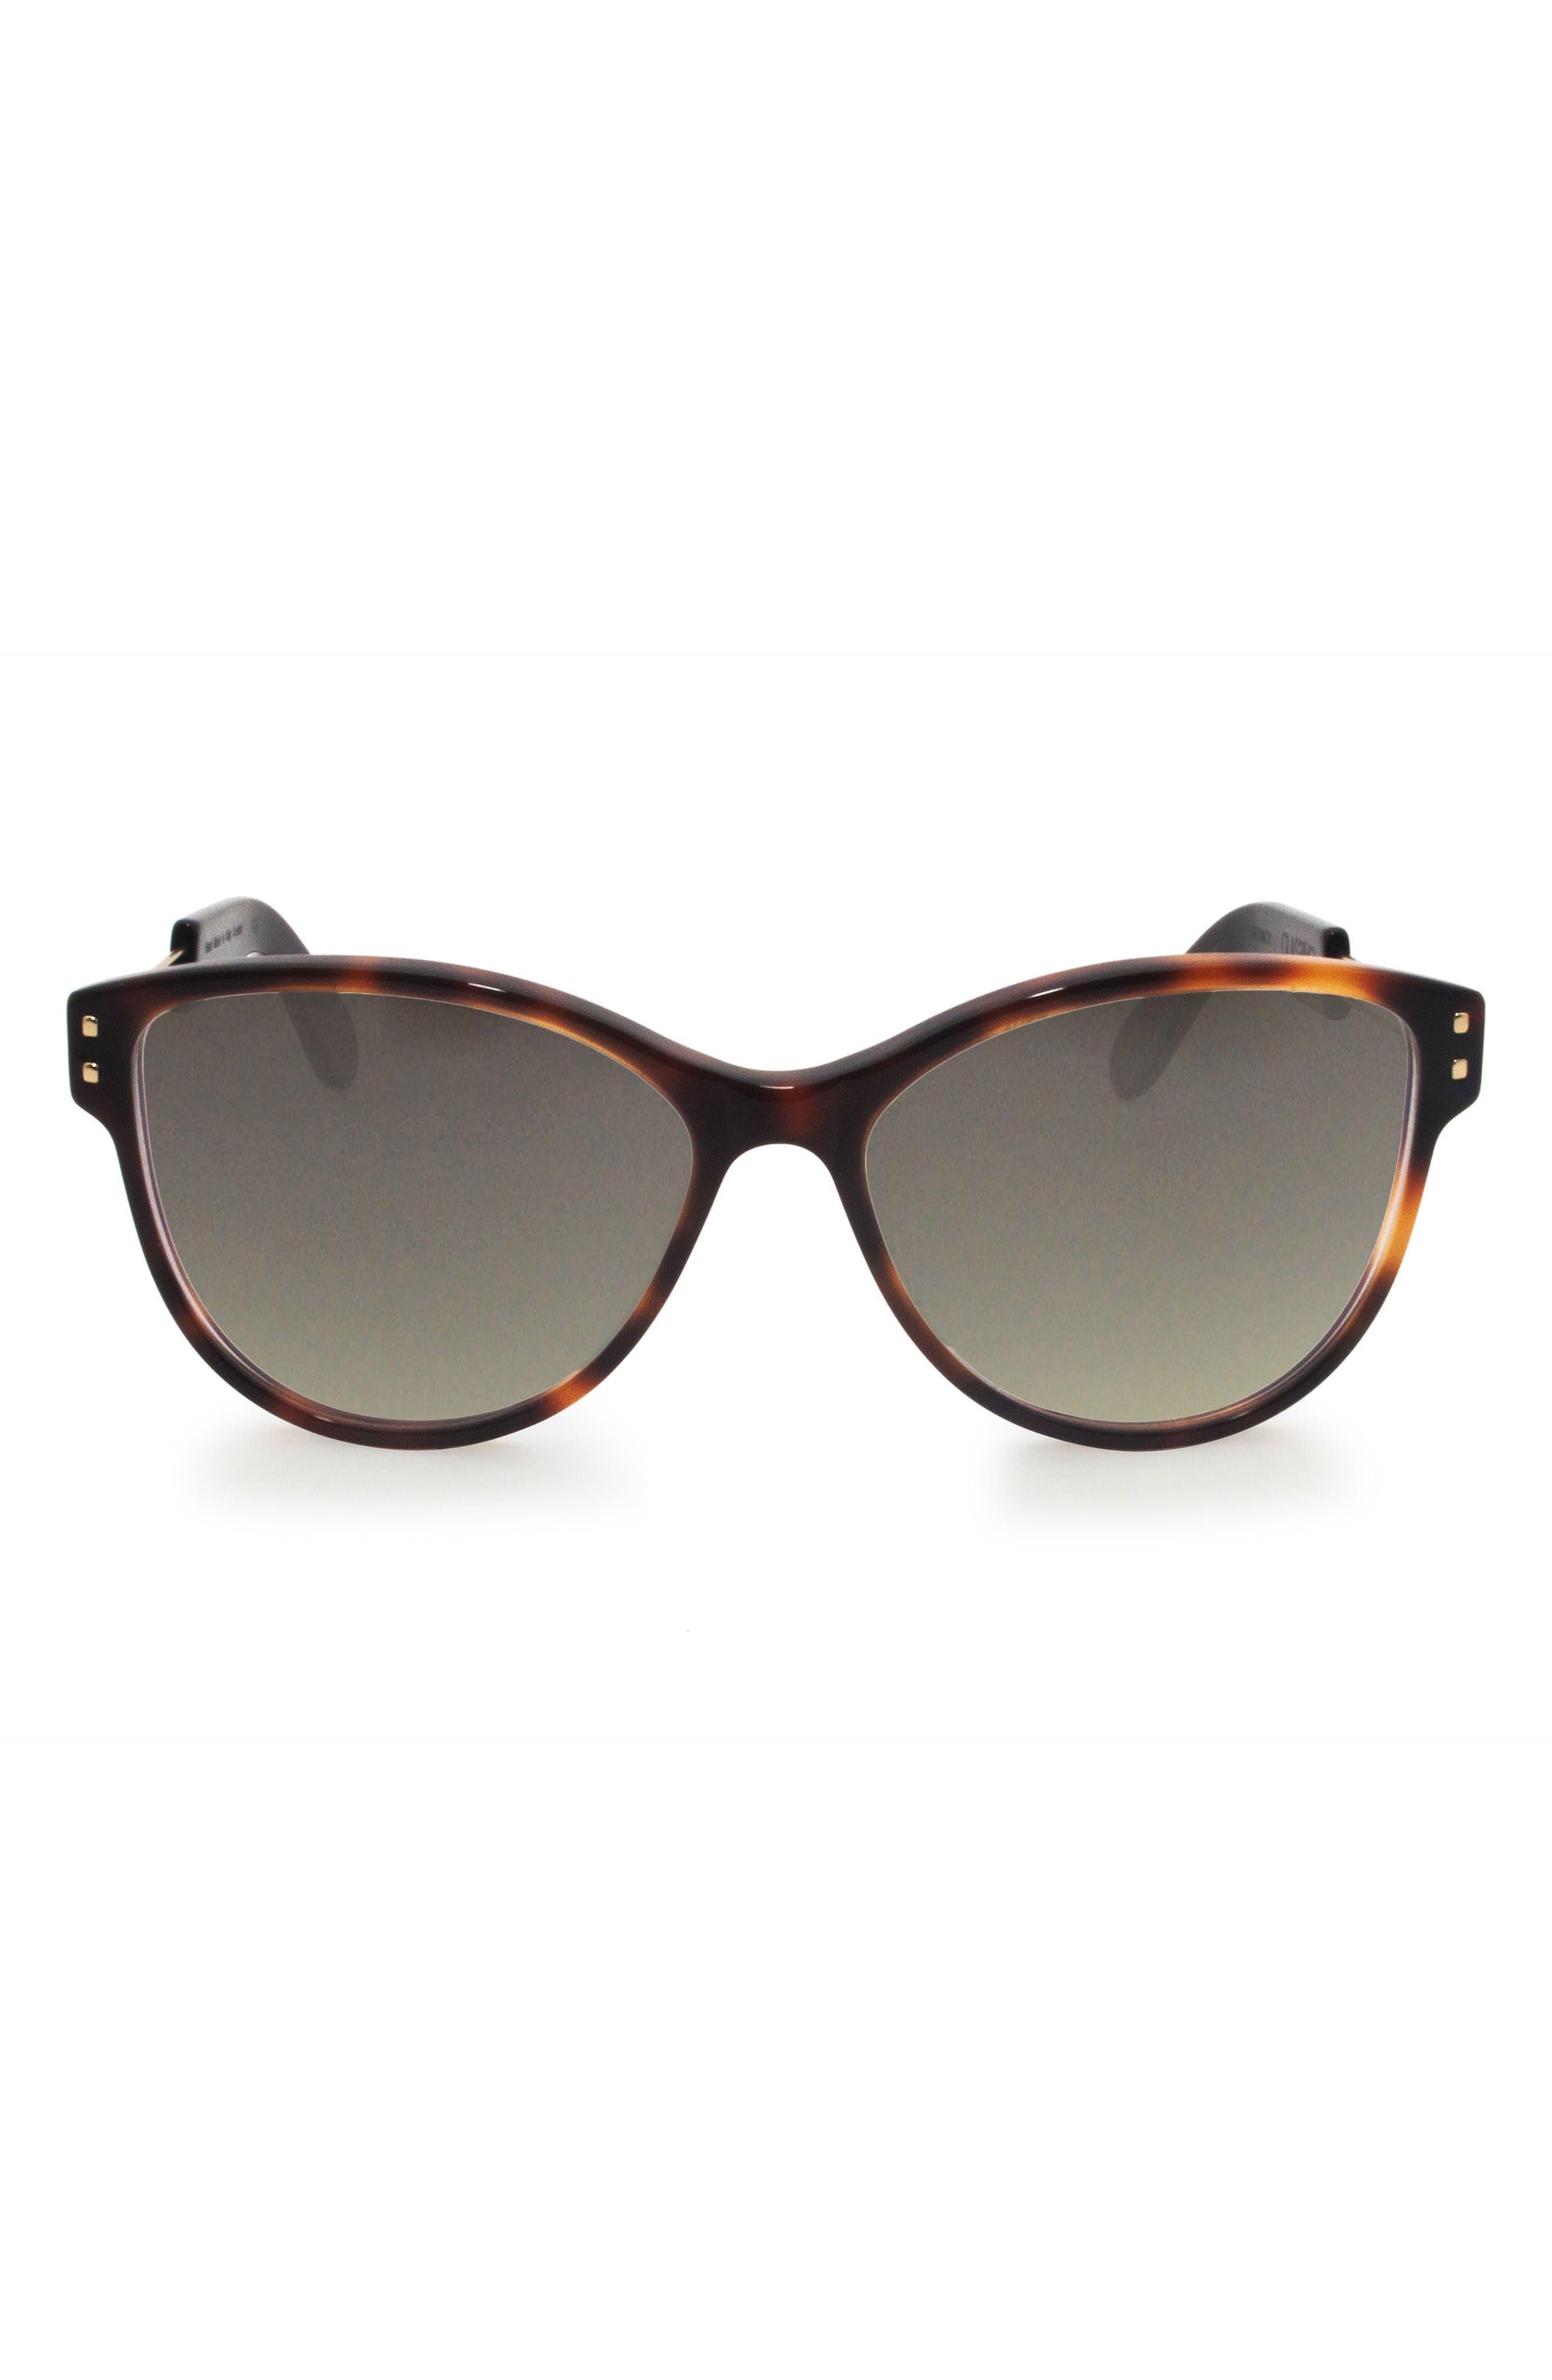 Main Image - GLASSING Francy 56mm Gradient Cat Eye Sunglasses